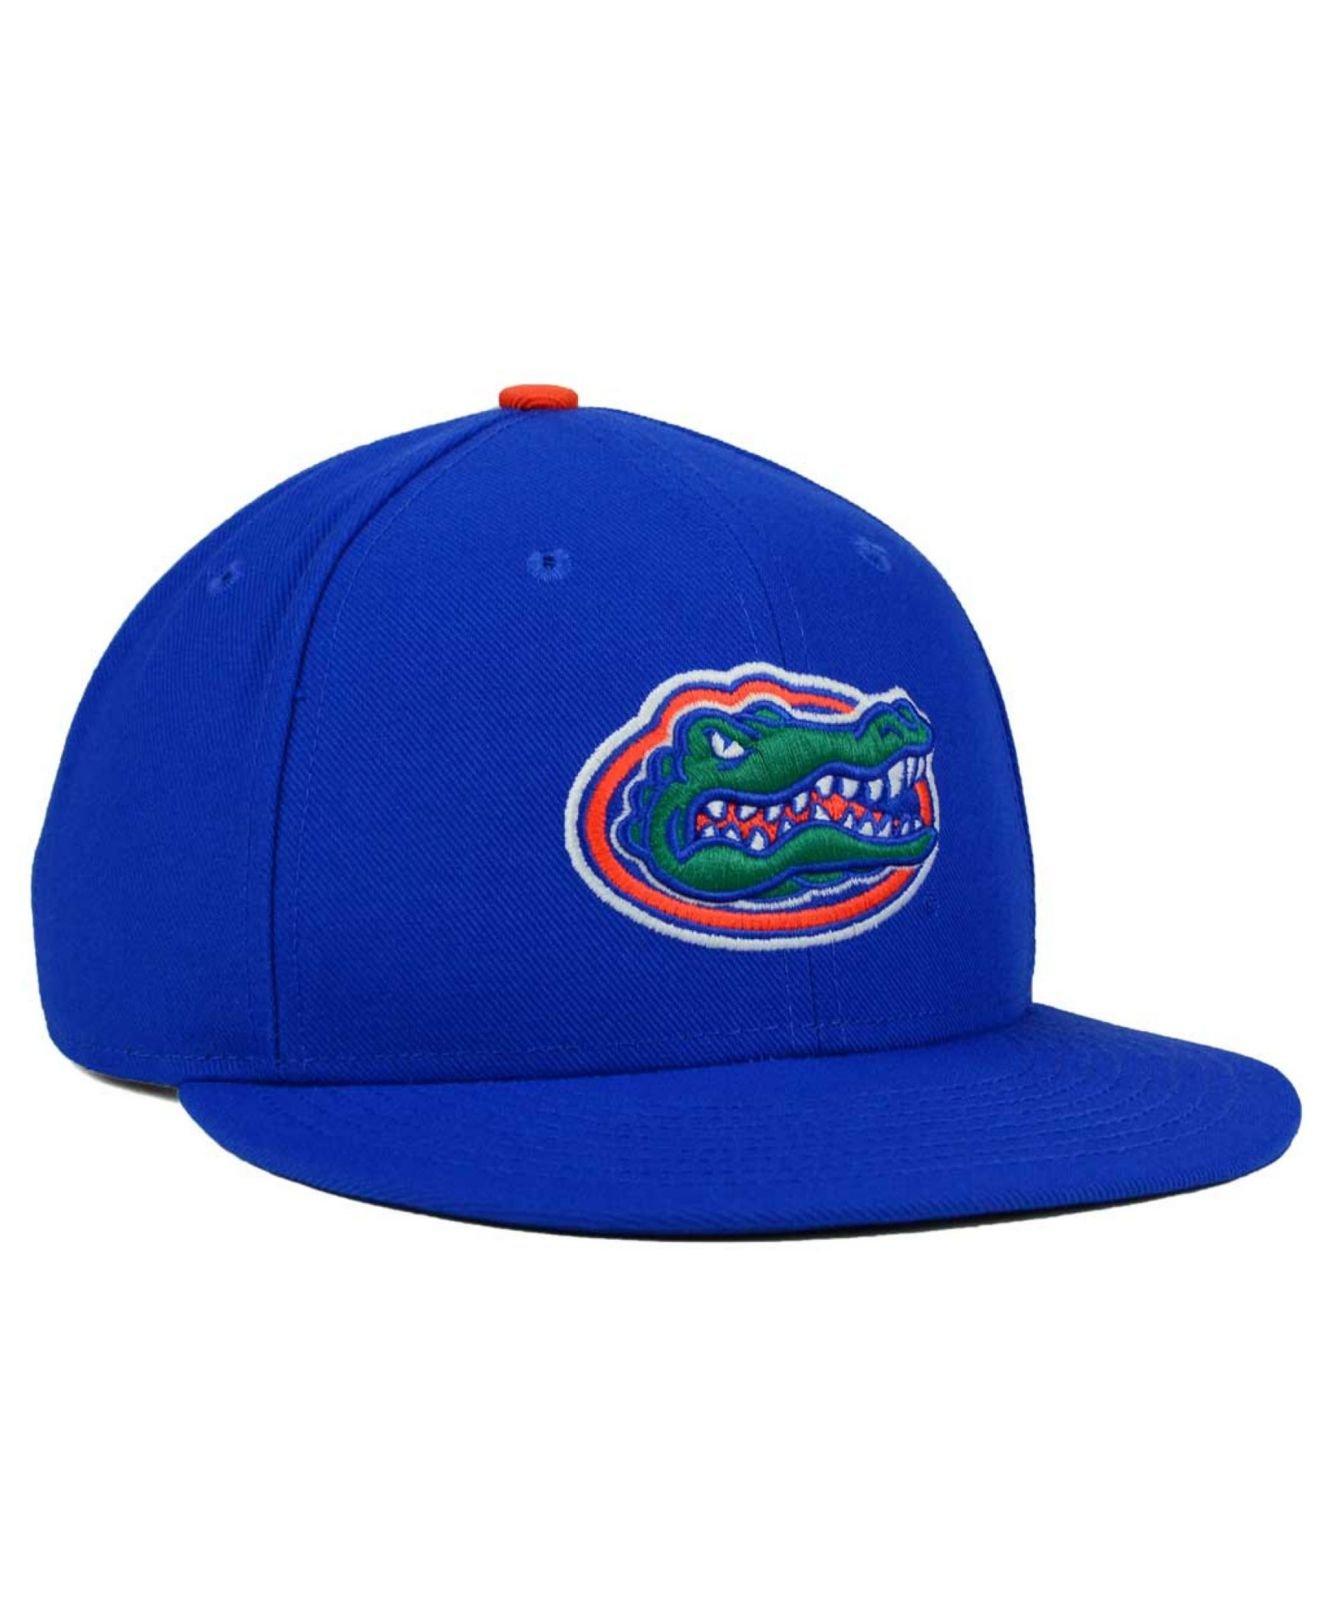 Lyst - Nike Florida Gators True Hardwood Seasonal Cap in Blue for Men 6085a4181443